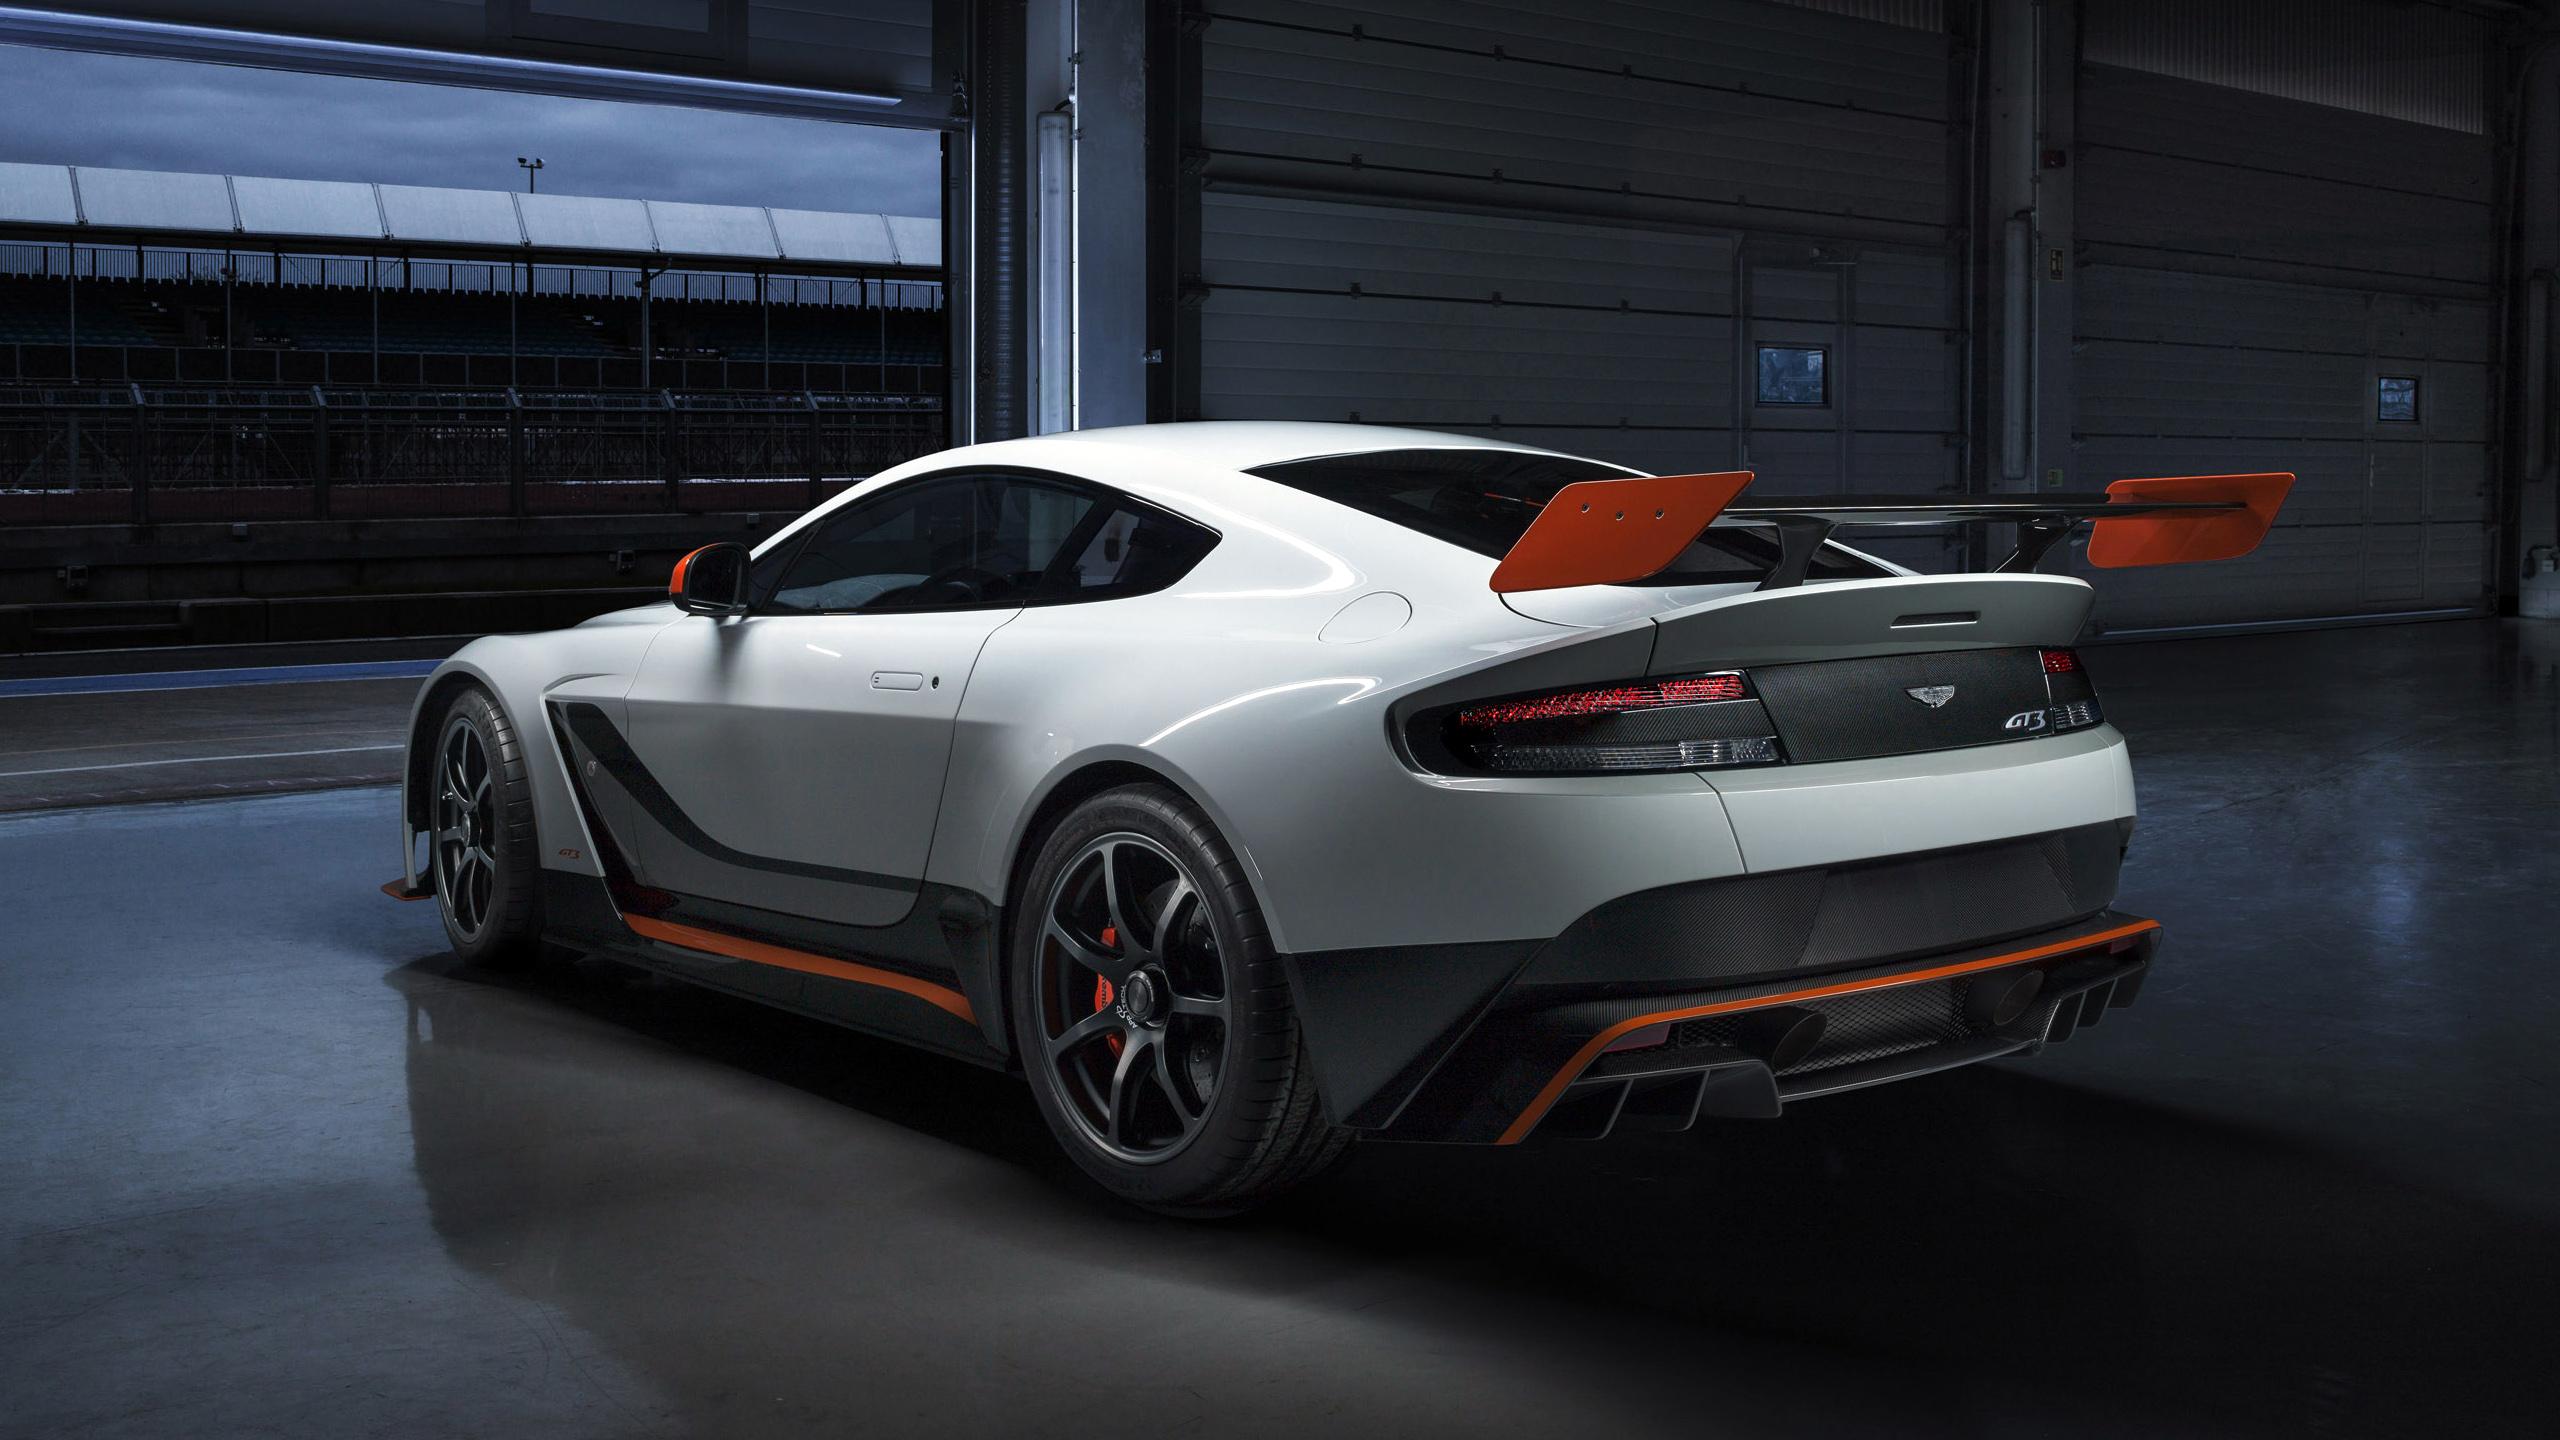 2015 Aston Martin Vantage GT3 Special Edition 3 Wallpaper HD Car 2560x1440